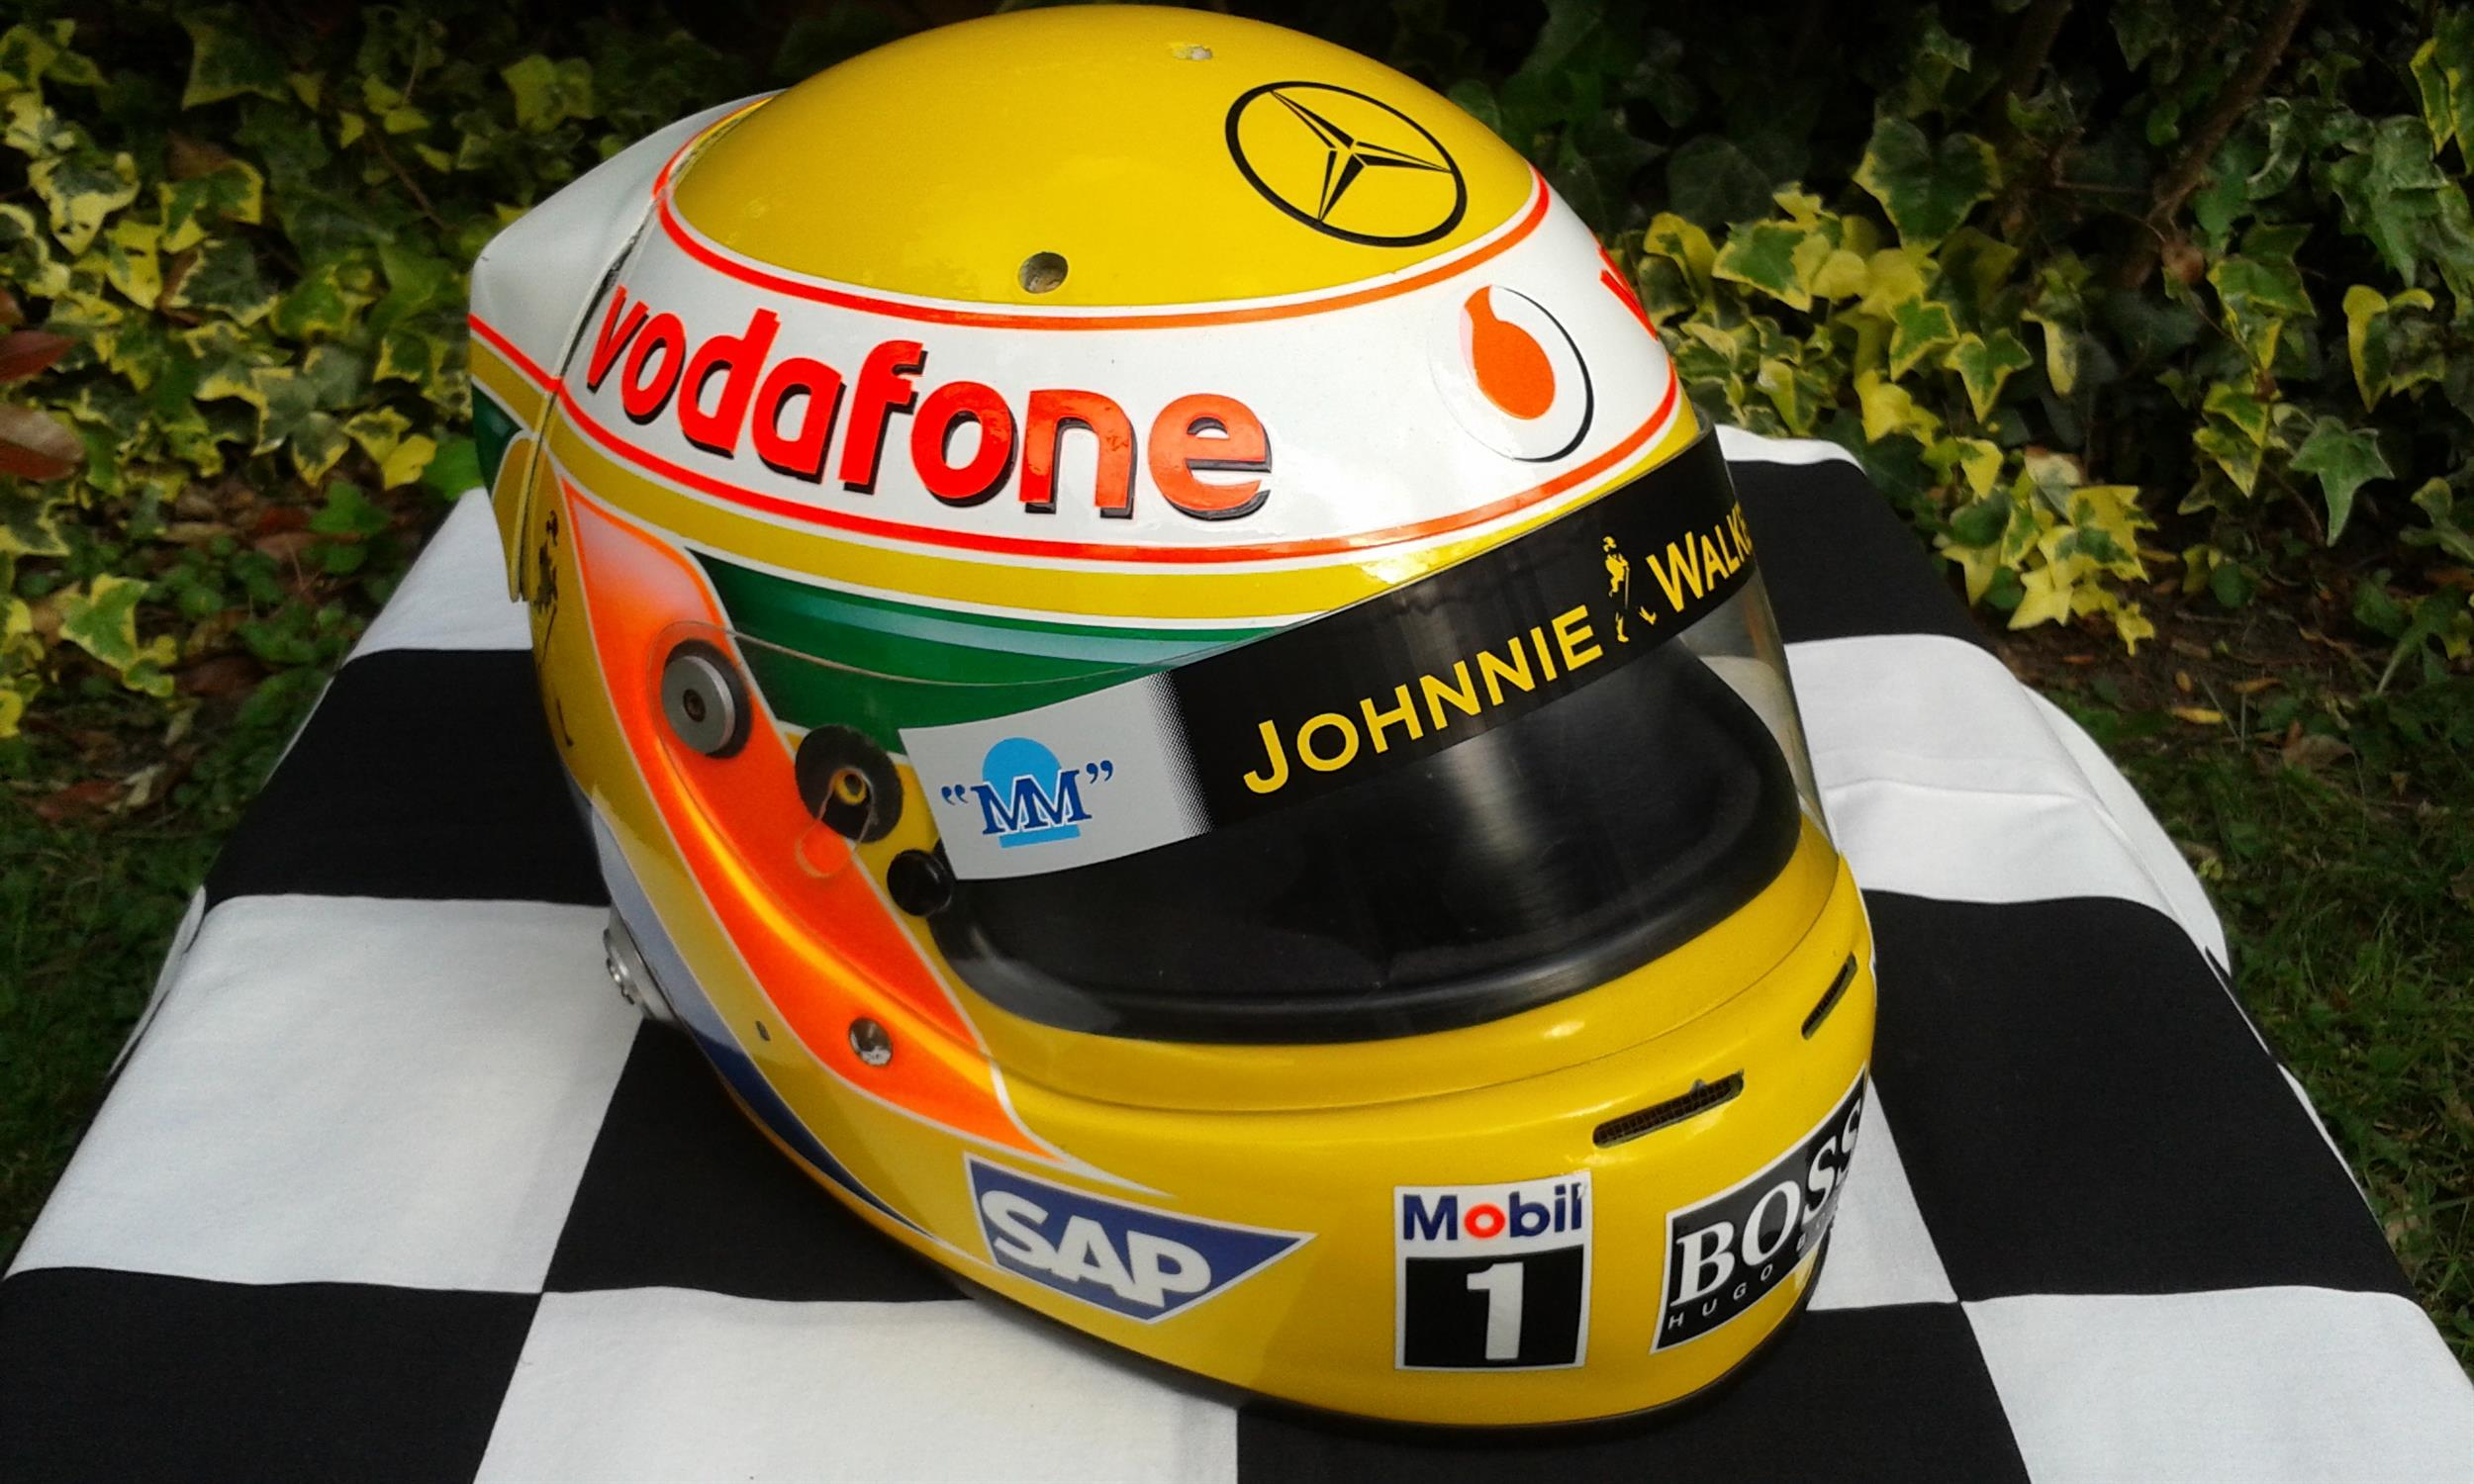 Lewis Hamilton 2008 World Championship winning Year Replica Helmet